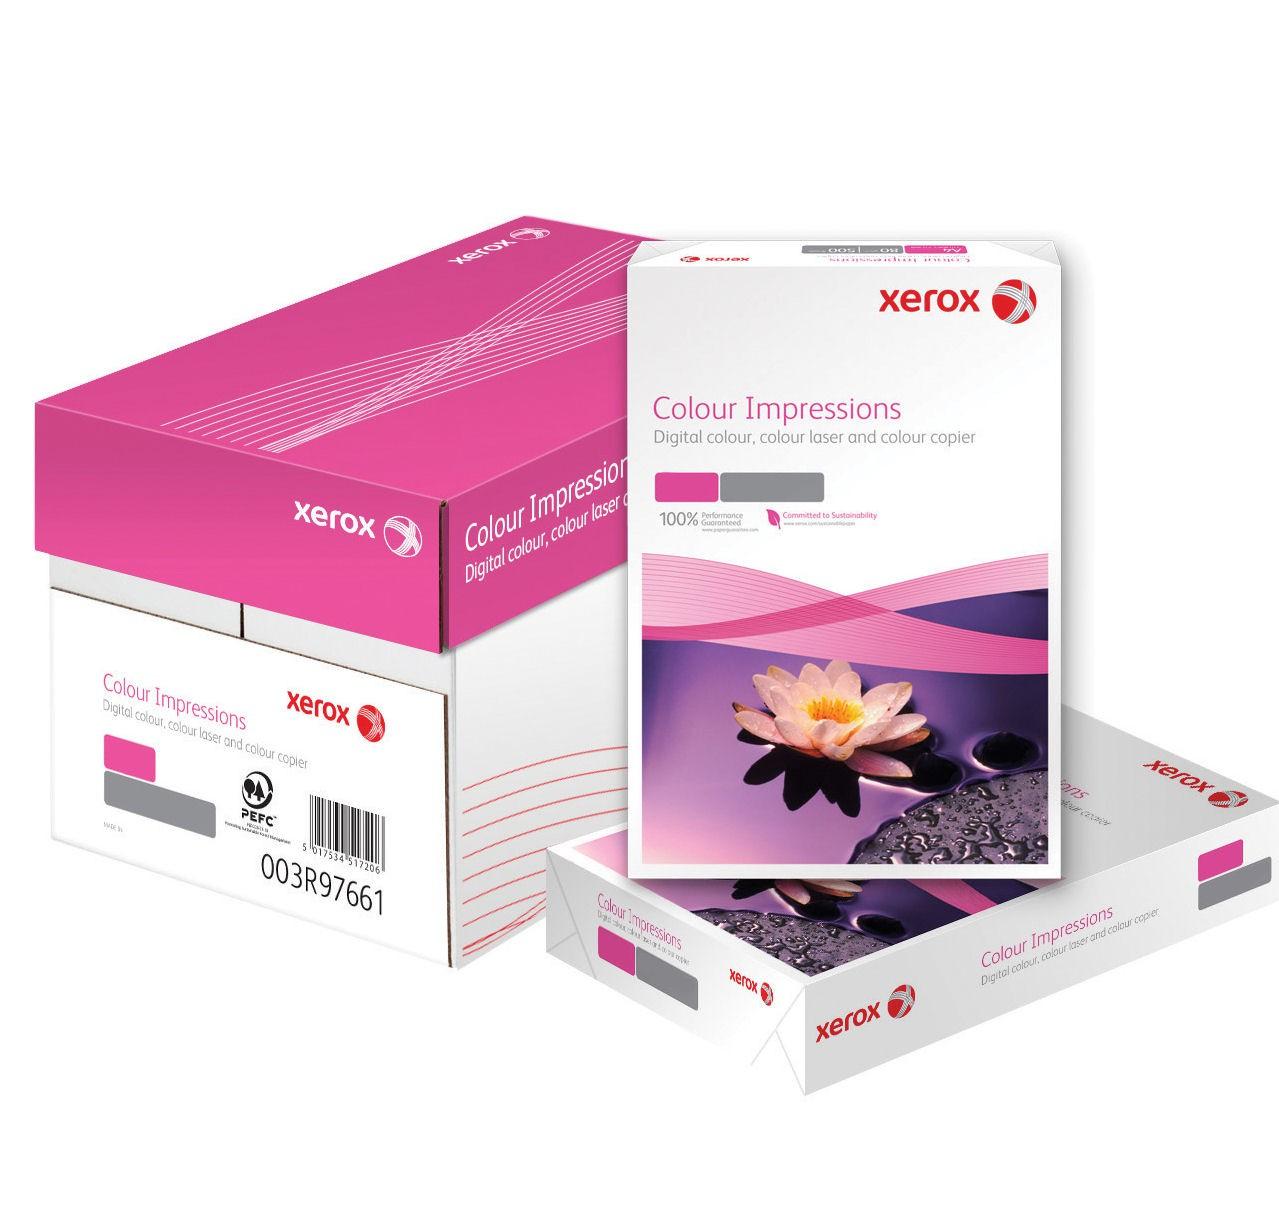 Xerox Colour Impressions A4 210X297mm PEFC 120Gm2 LG Pack 500 003R98685